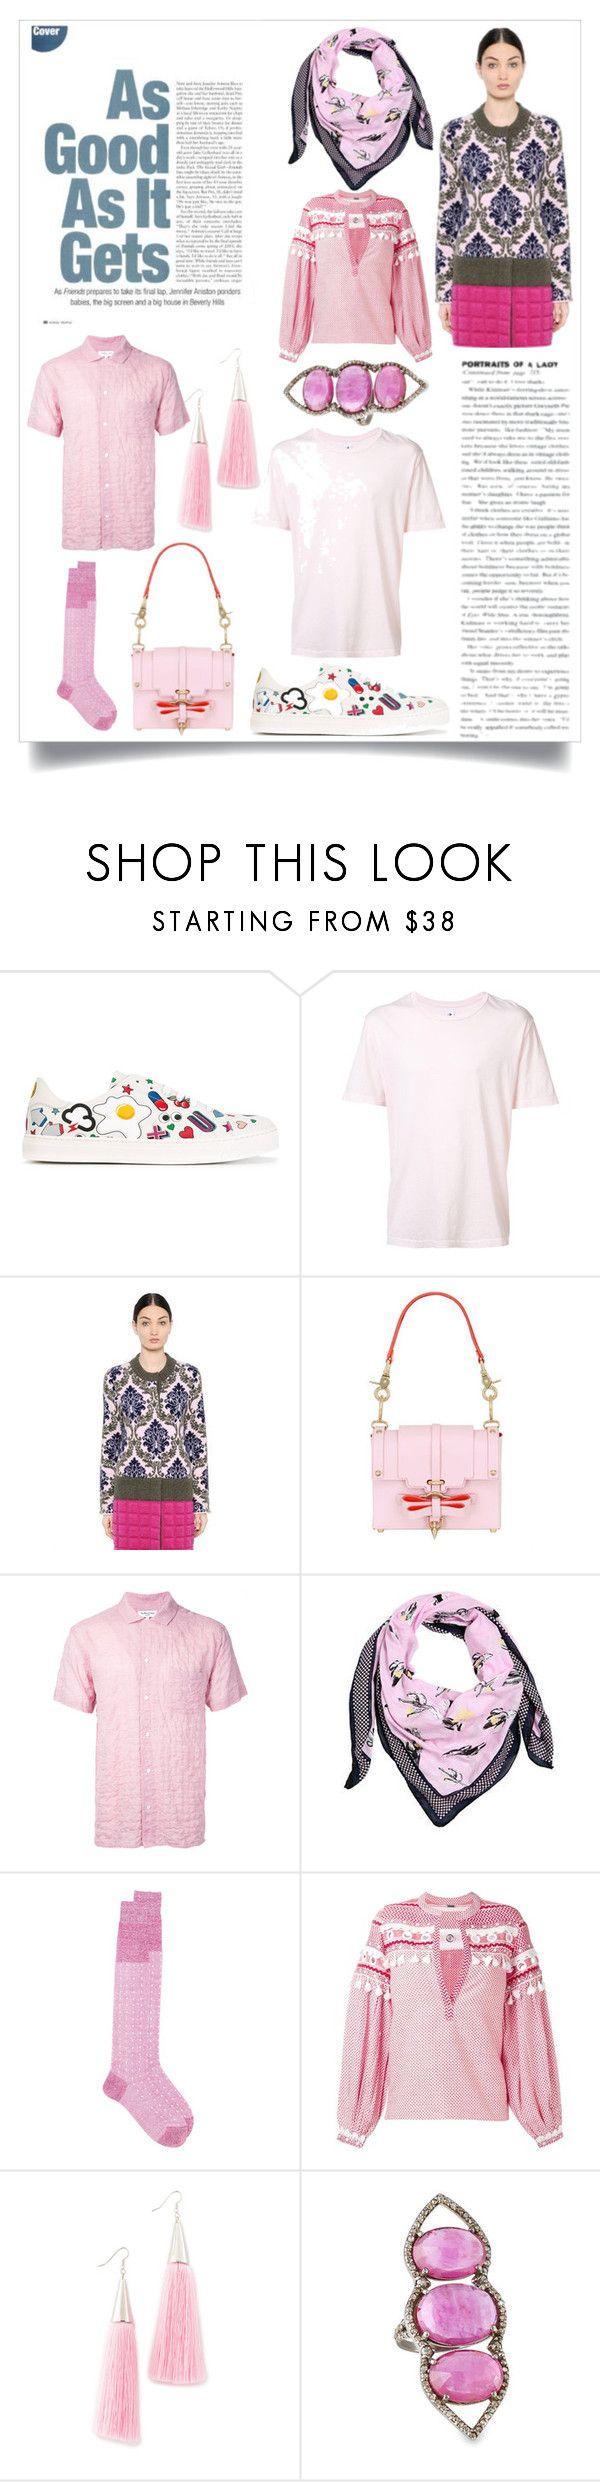 """Vintage Florals"" by ramakumari ❤ liked on Polyvore featuring Anya Hindmarch, 321, Mary Katrantzou, Niels Peeraer, YMC, Kenzo, Fashion Clinic, Dodo Bar Or, Eddie Borgo and Bavna"